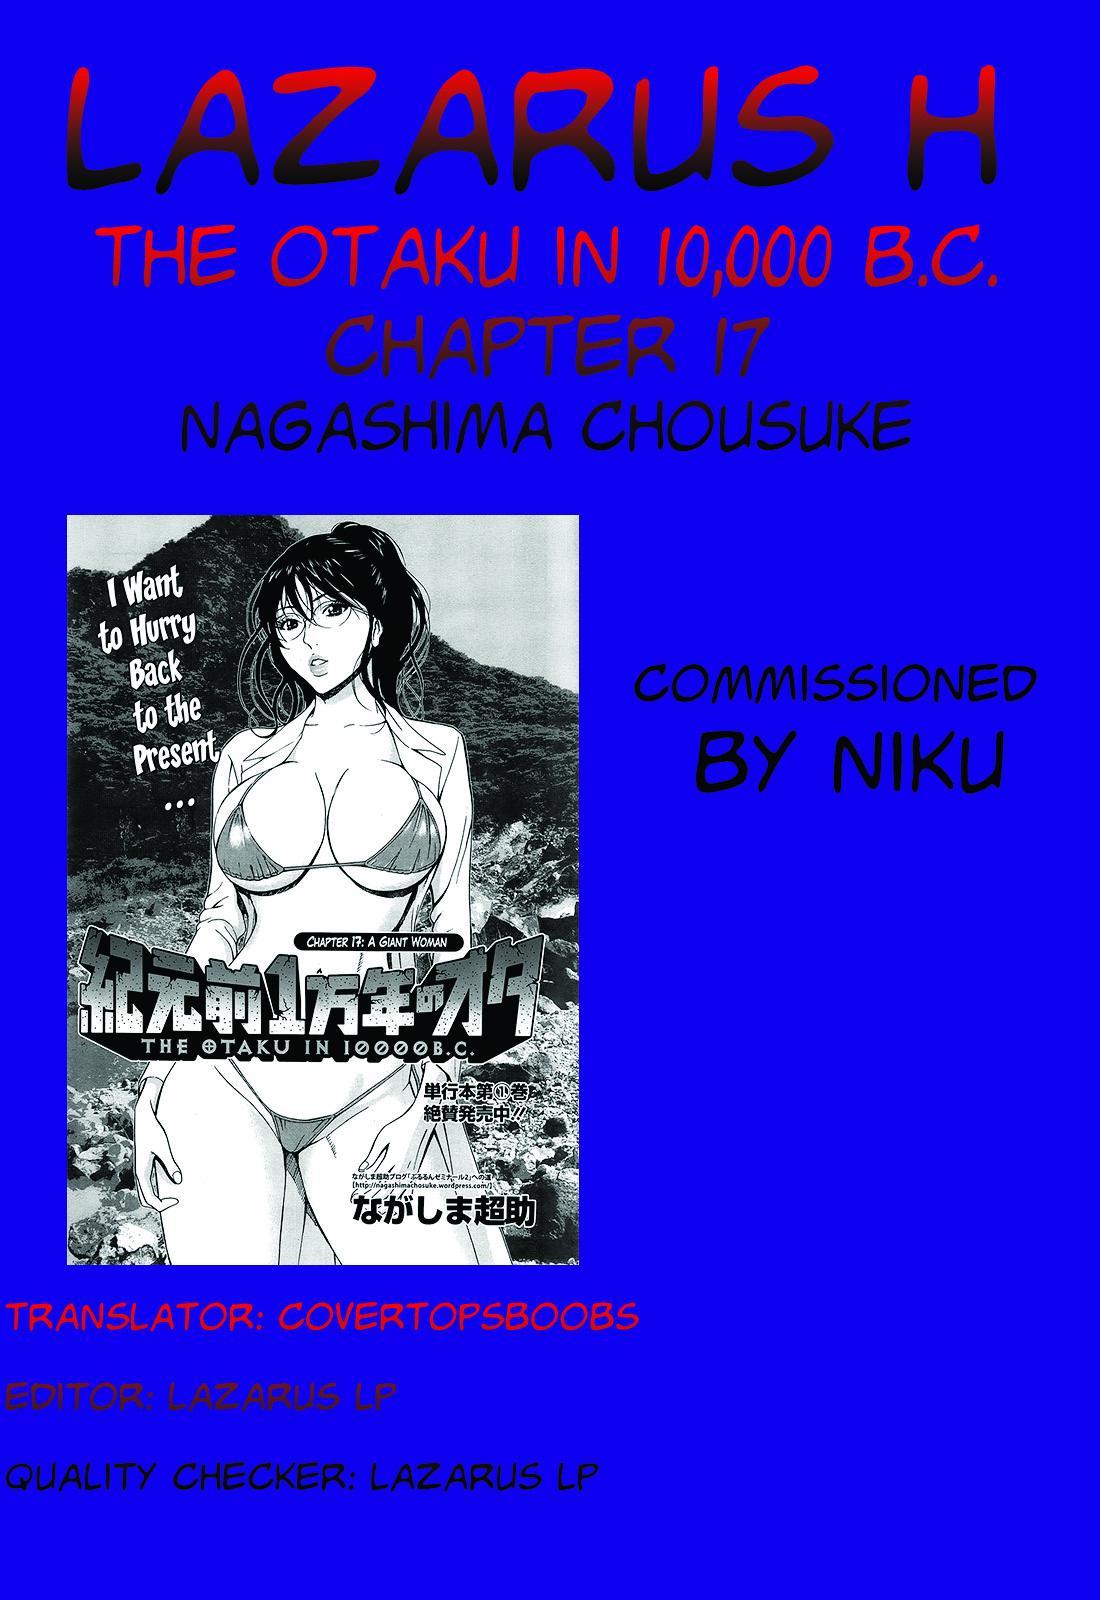 Kigenzen 10000 Nen no Ota   The Otaku in 10,000 B.C. Ch. 1-22 327